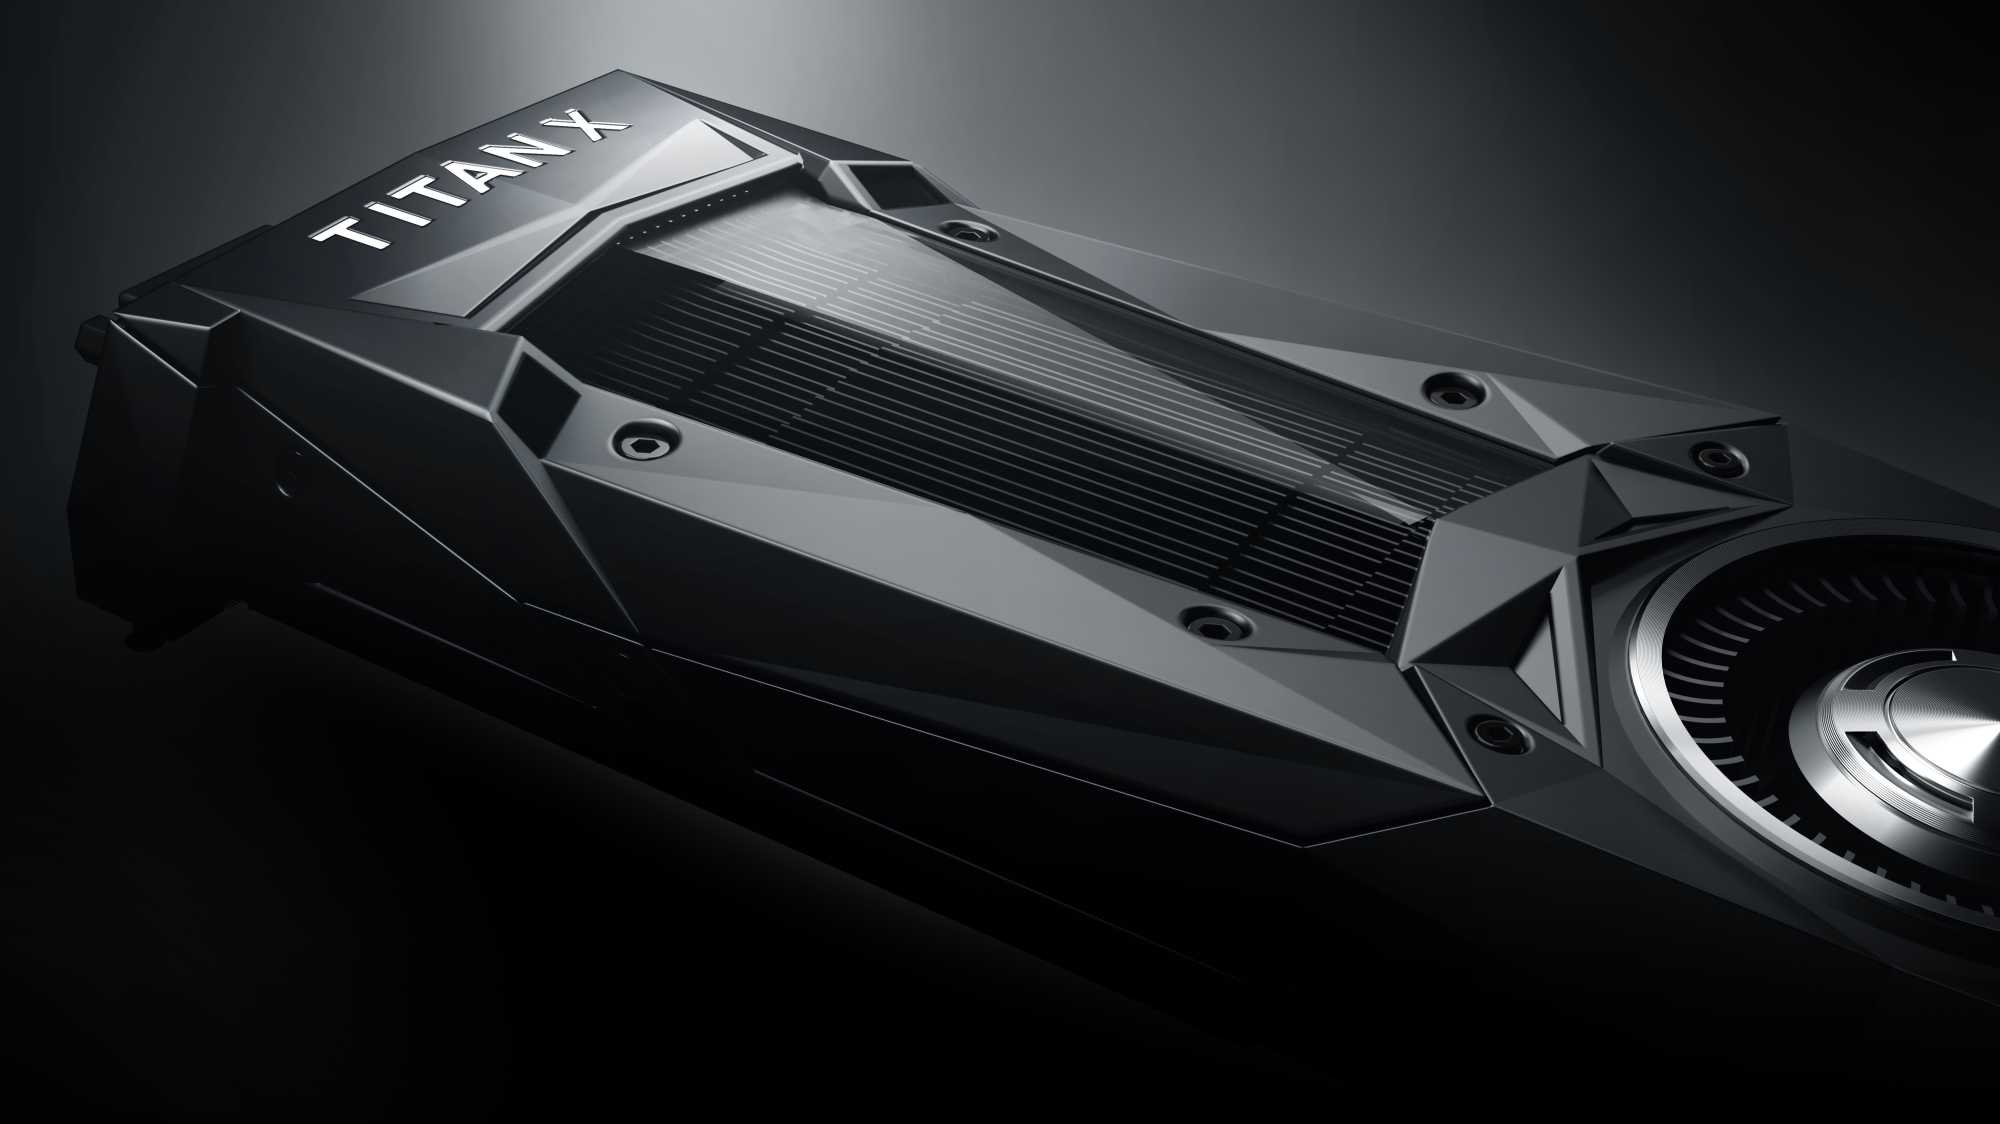 Neues Nvidia-Flaggschiff mit fast 4000 Kernen: Titan Xp fürs Ultra-High-End